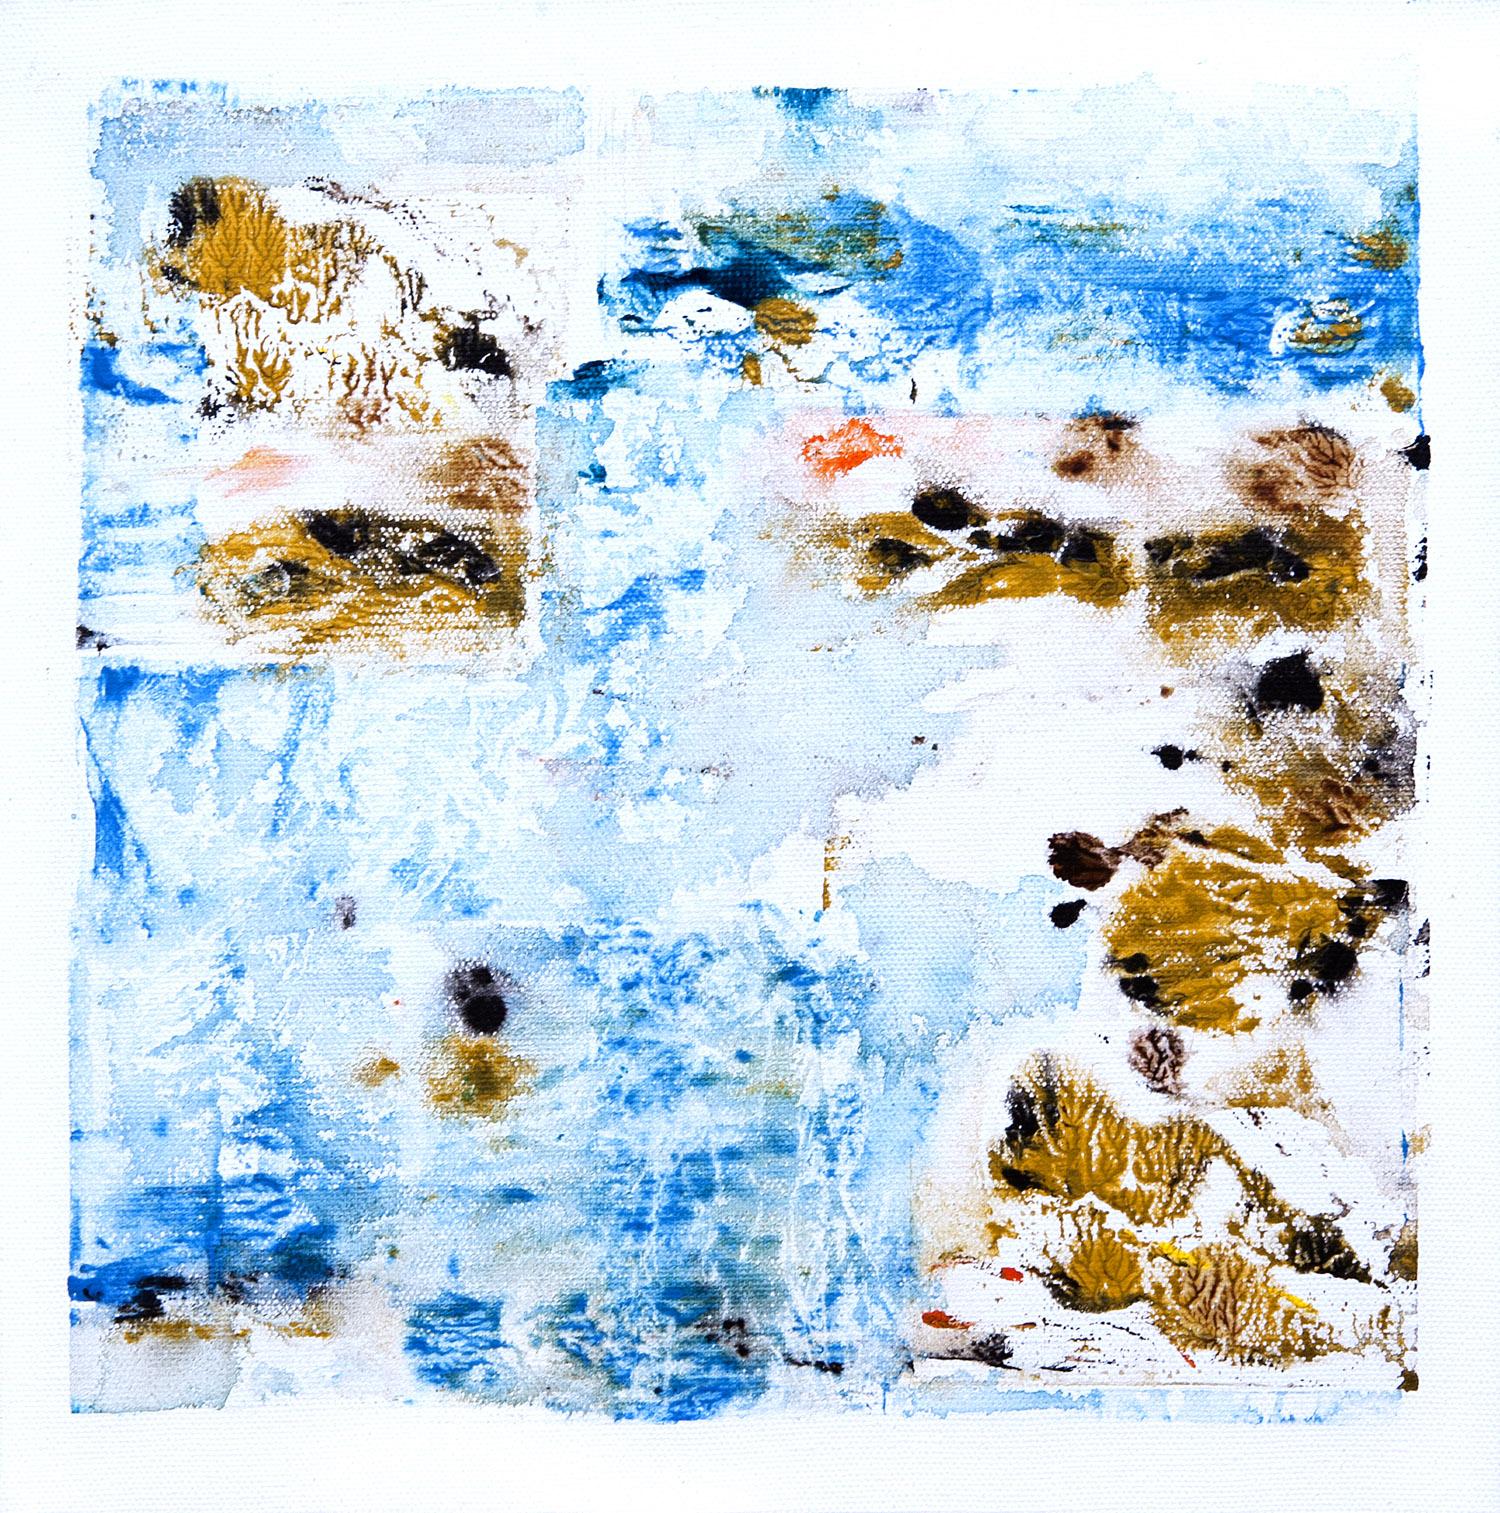 Bifurcarias, acrilico sobre lienzo, 30x30cm, 2014.jpg